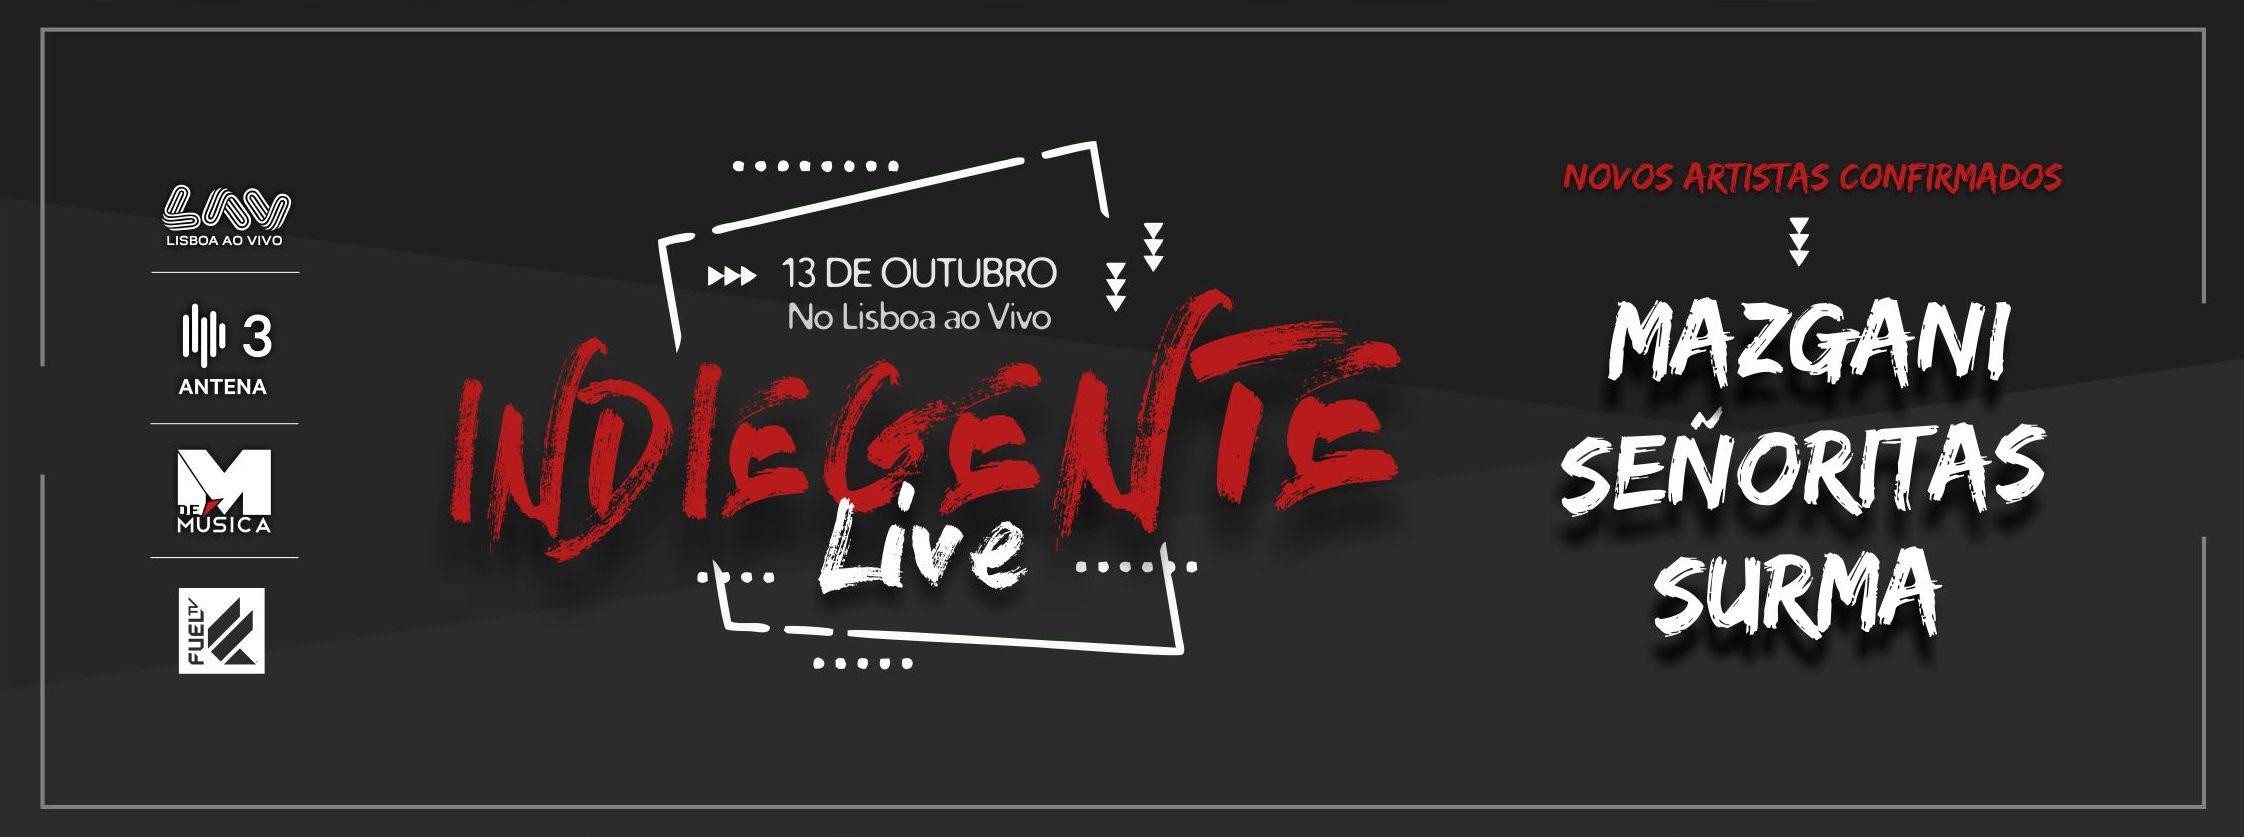 Cartaz Festival 2018 - Indiegente Live